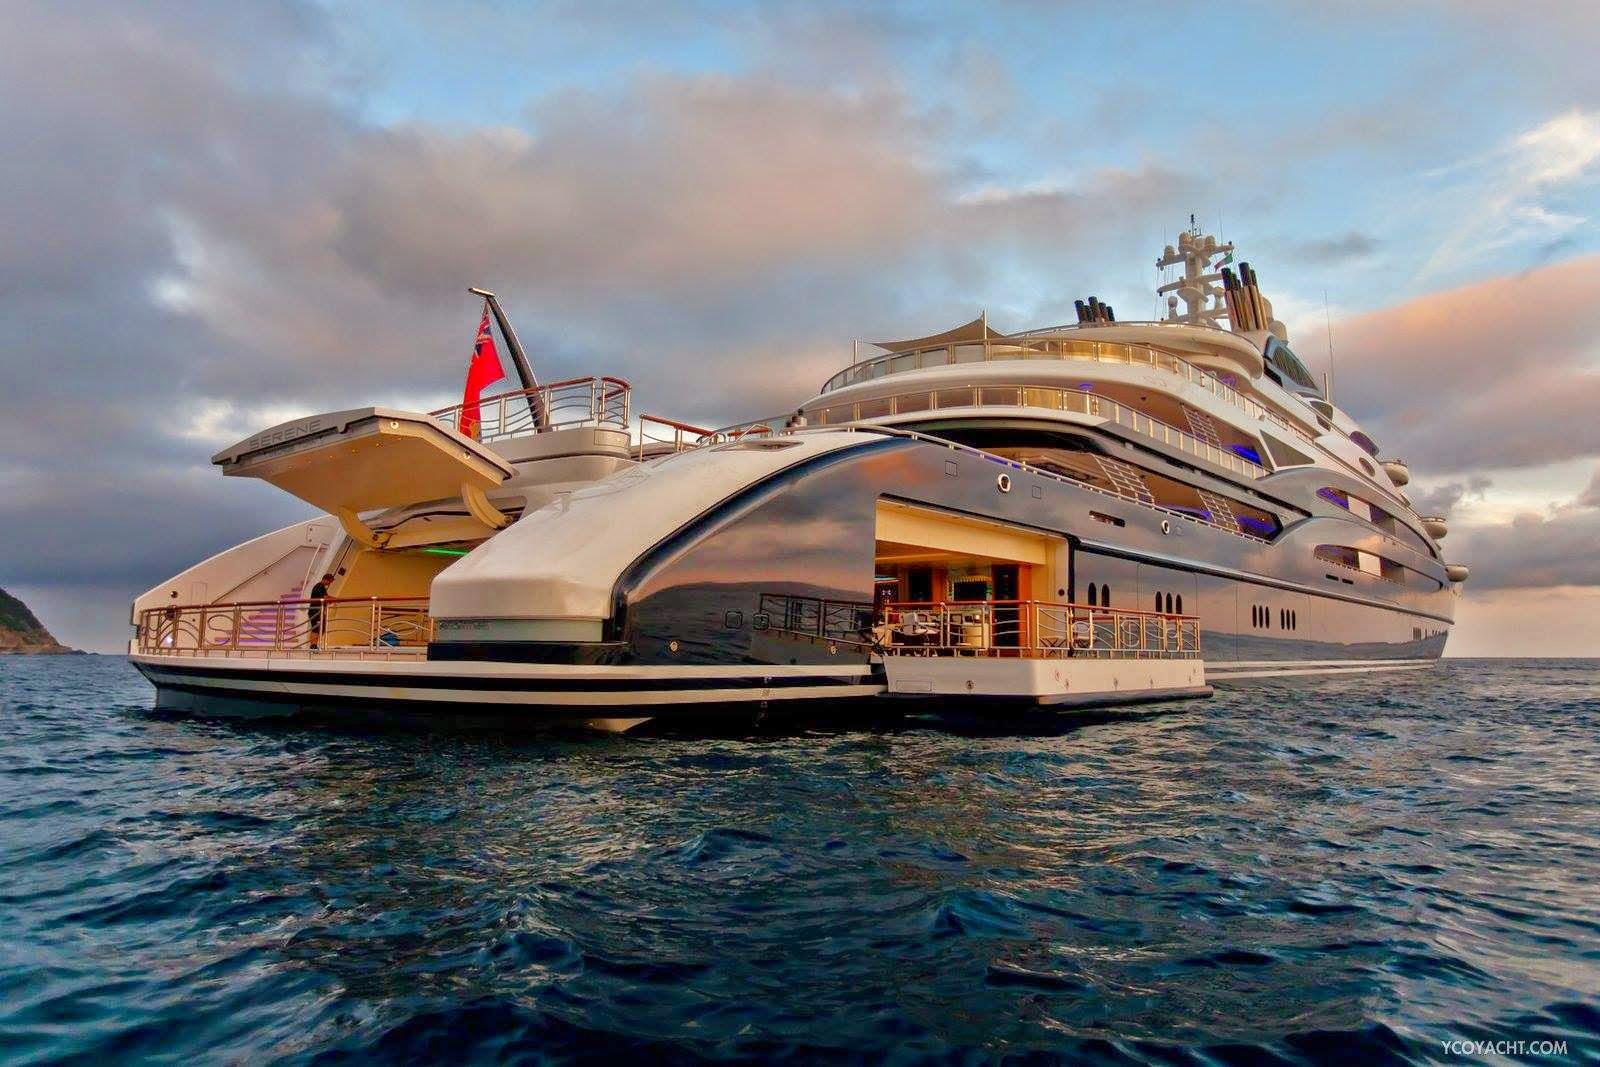 Luxury Yacht Fincantieri Serene ghtzjfj